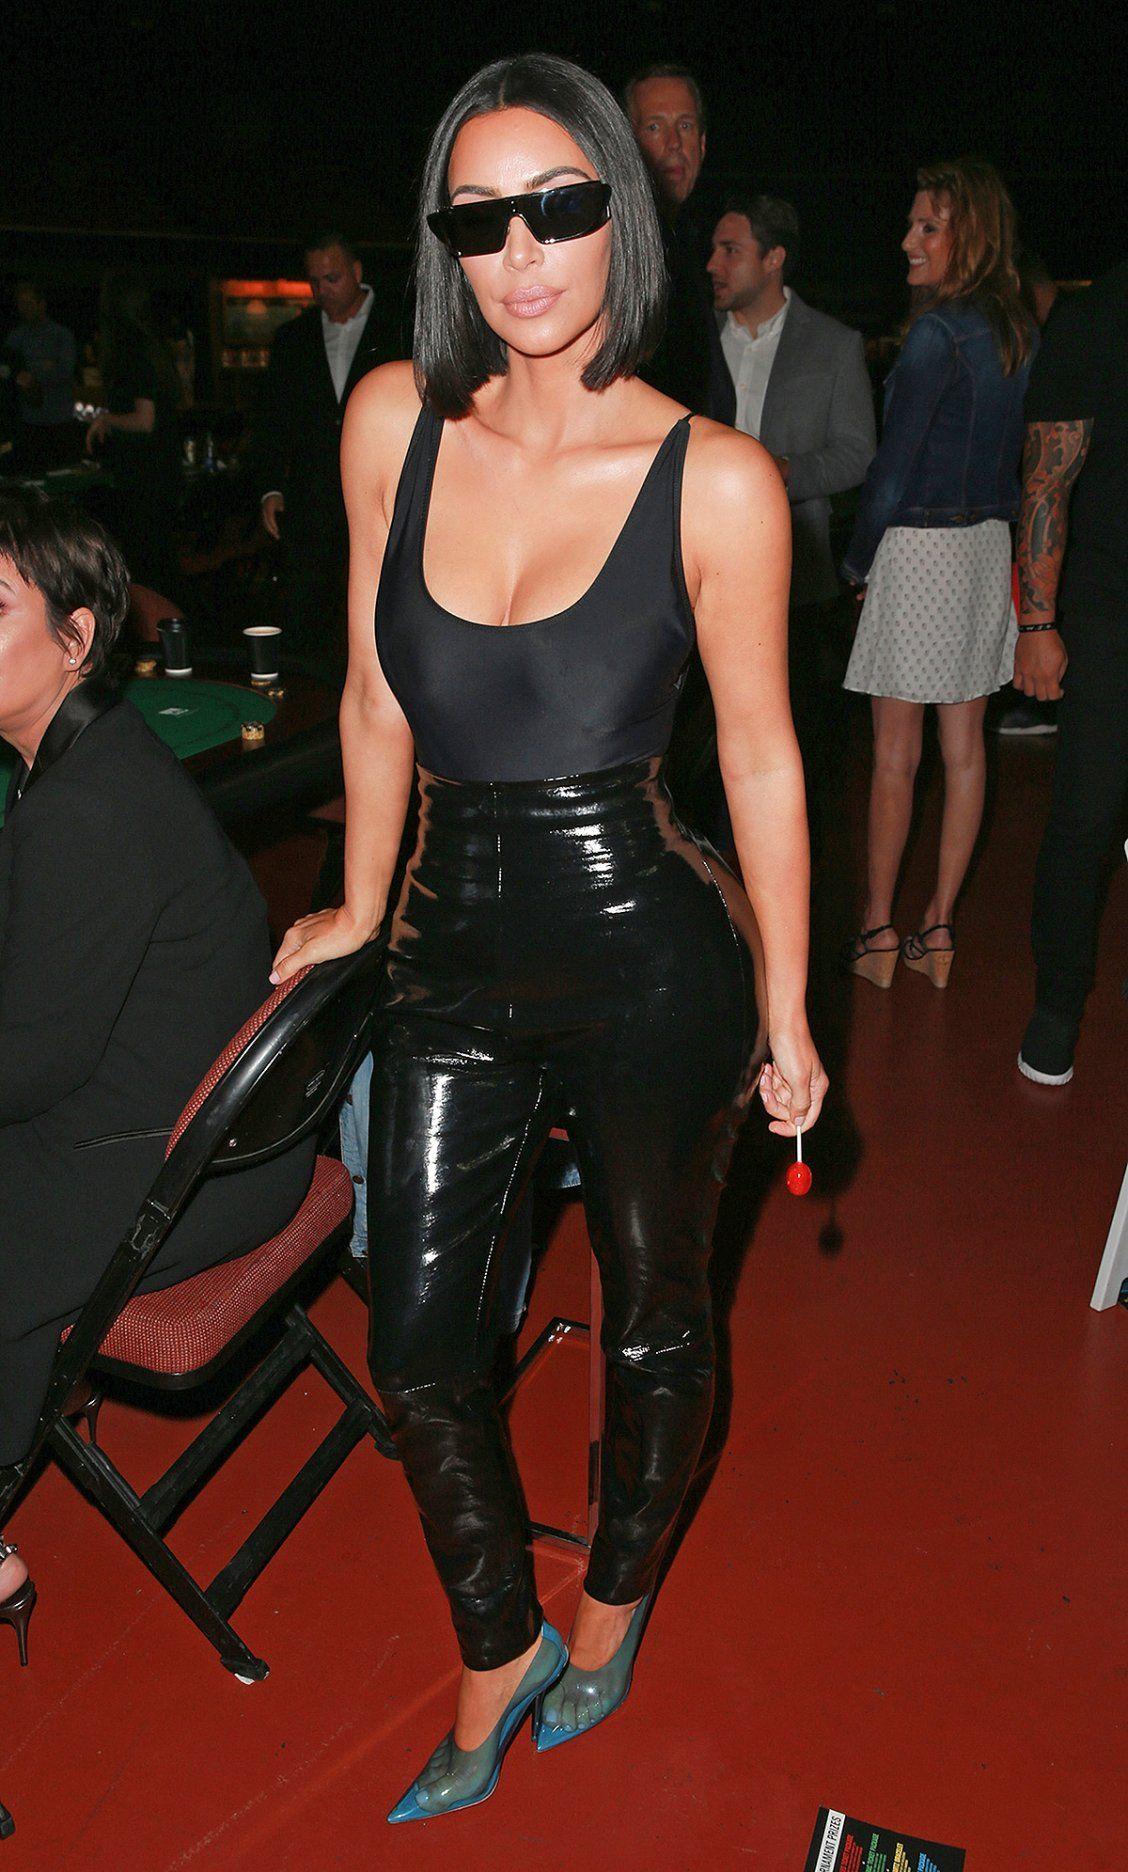 Latex much little time kim kardashian melbourne rare photo